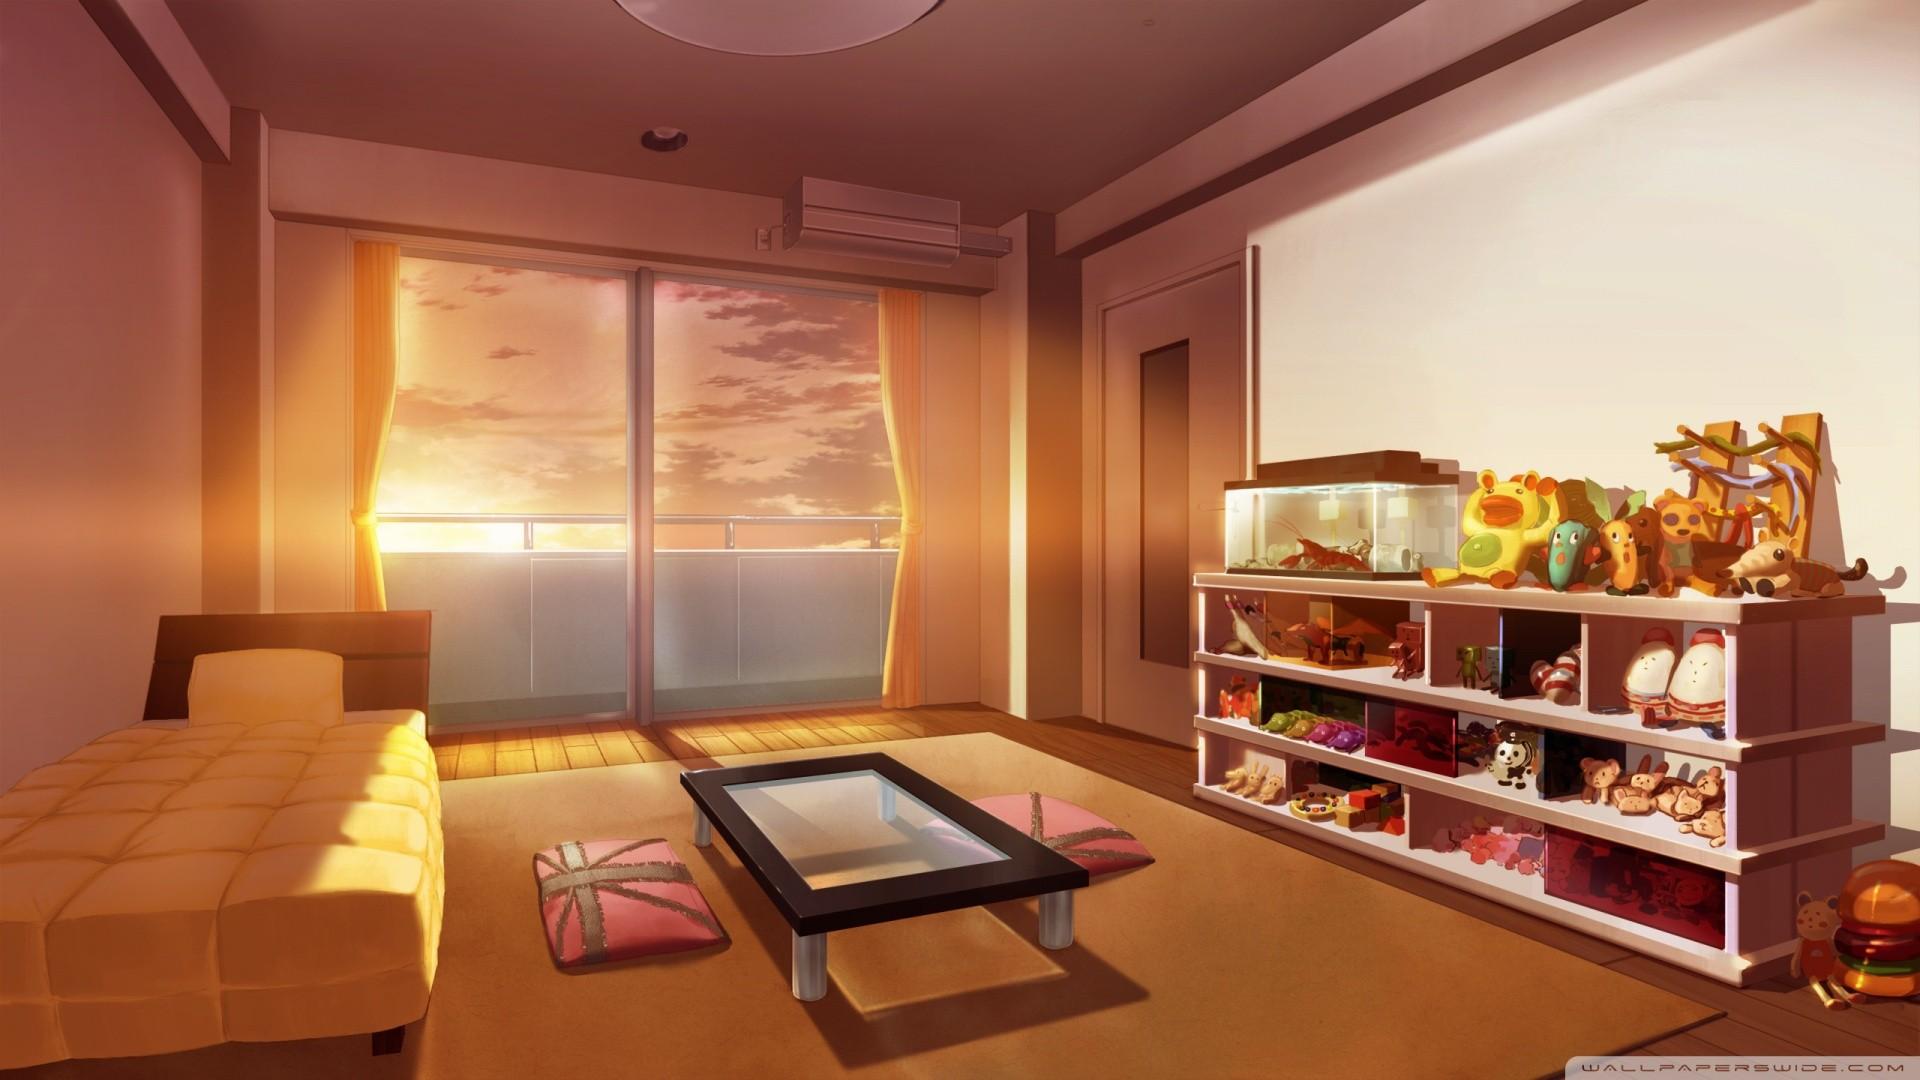 Wallpaper Japan Landscape City Anime Interior Design Peaceful Property Real Estate Recreation Room Living Room Suite 1920x1080 Thorragnarok 30460 Hd Wallpapers Wallhere